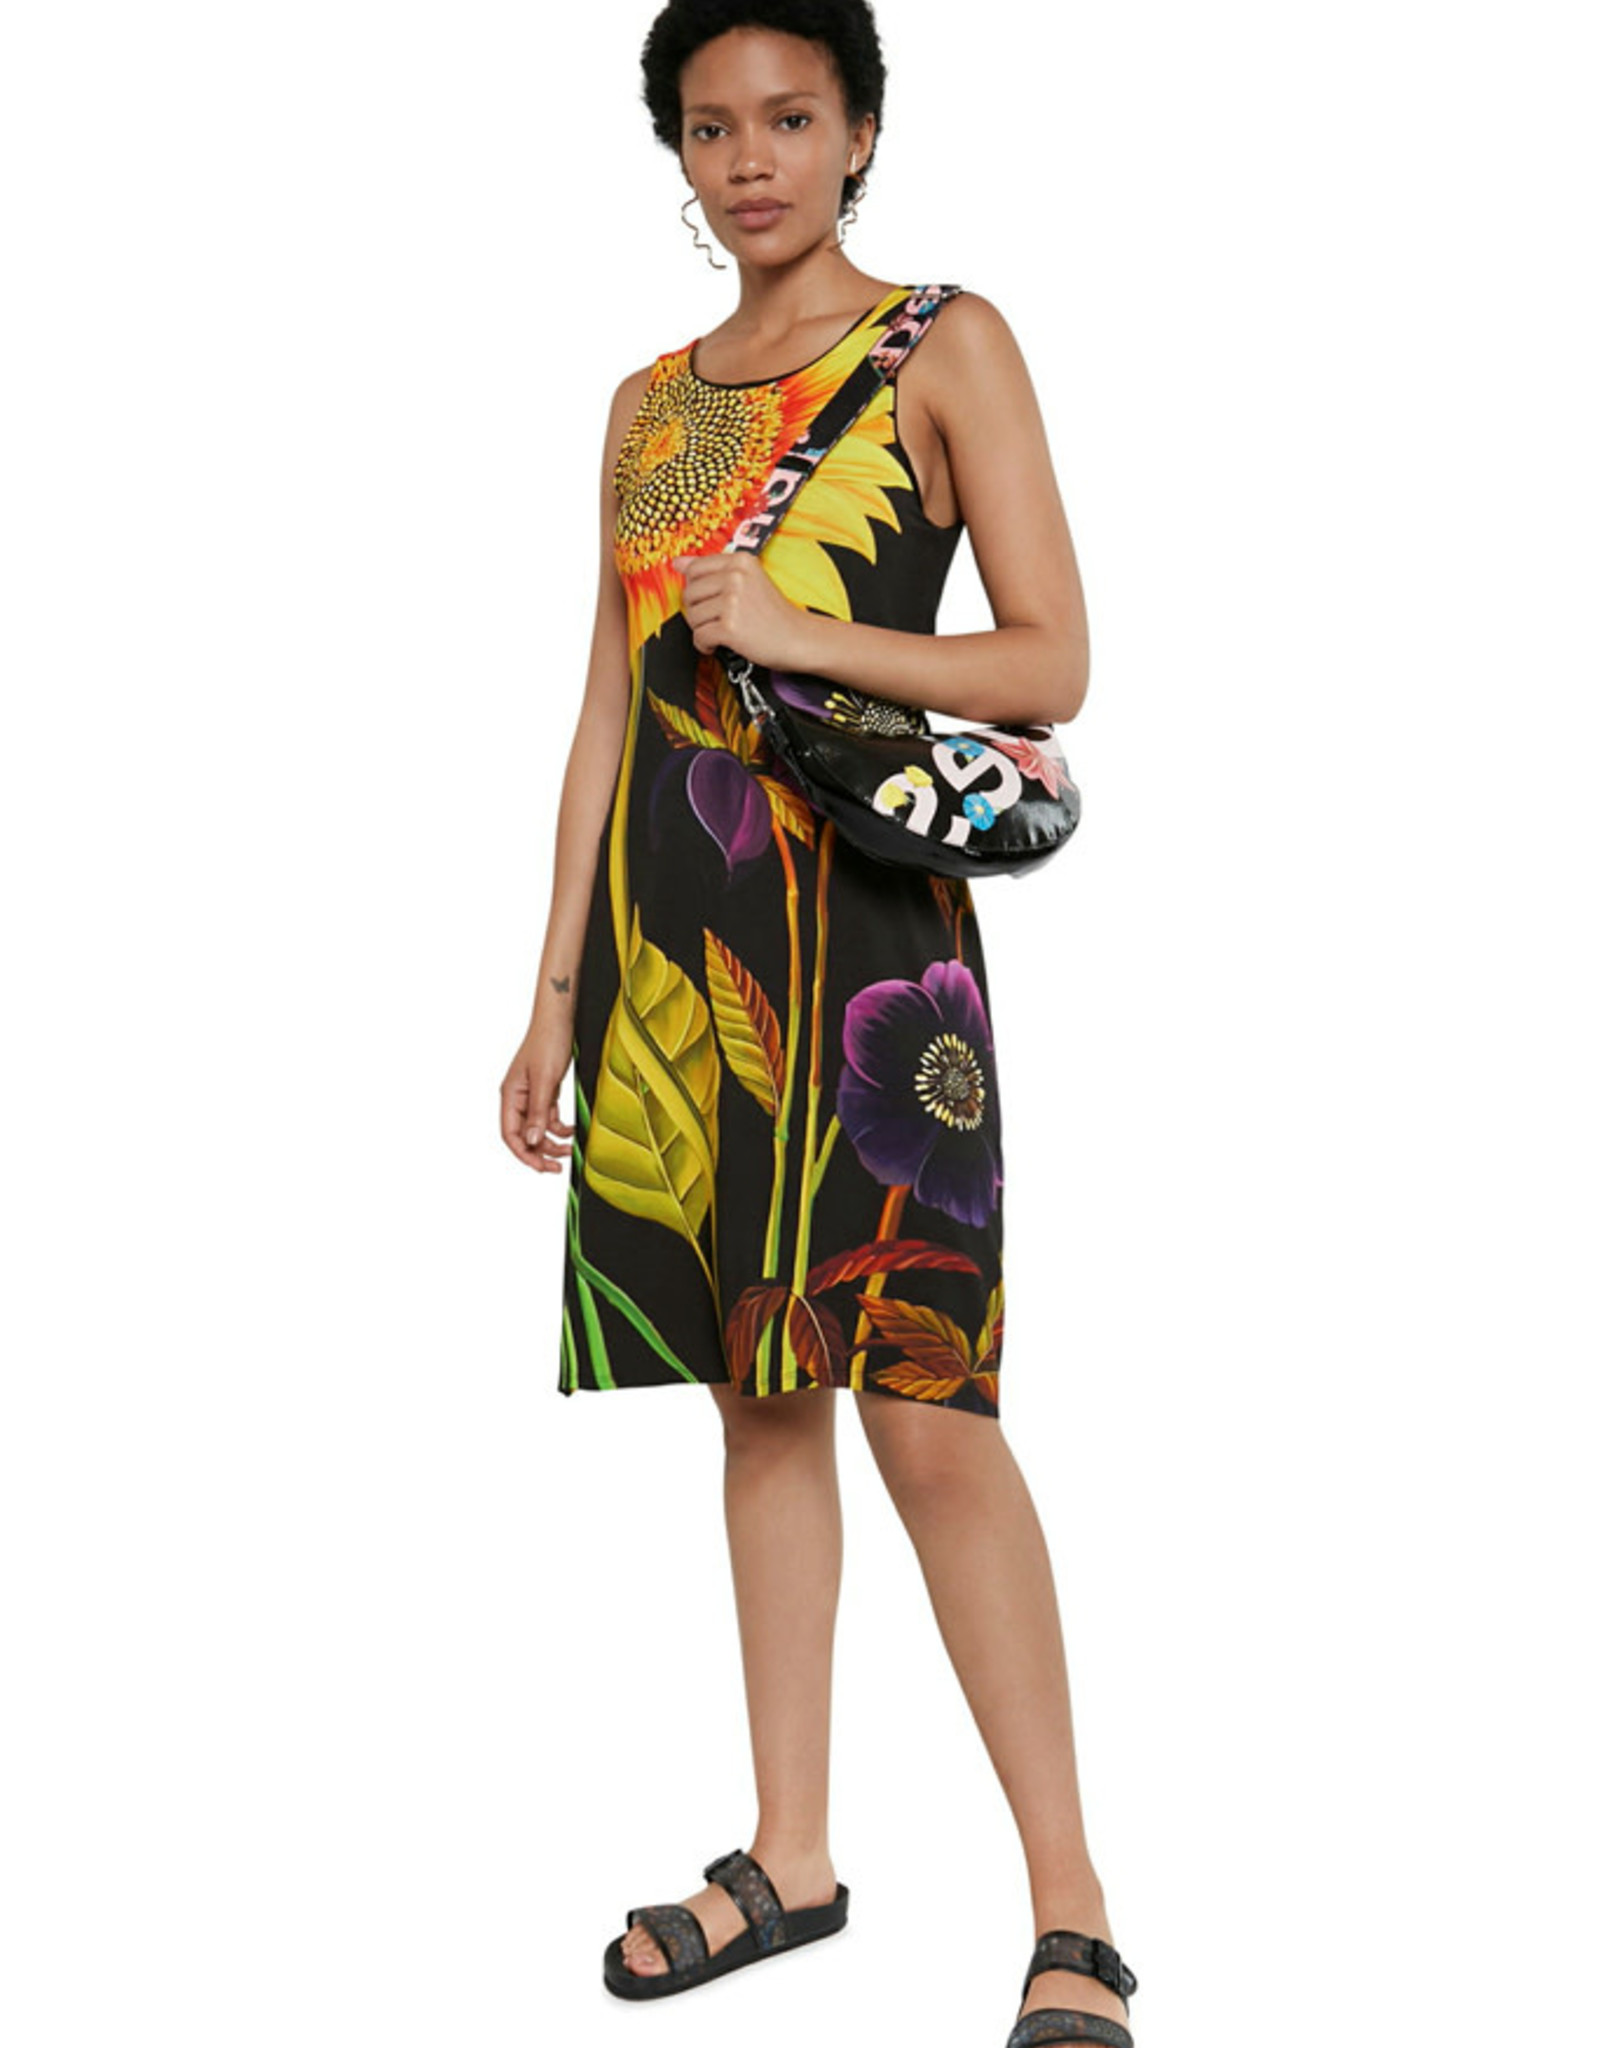 DESIG 21SWVKB3 2000 Marlon Black Dress